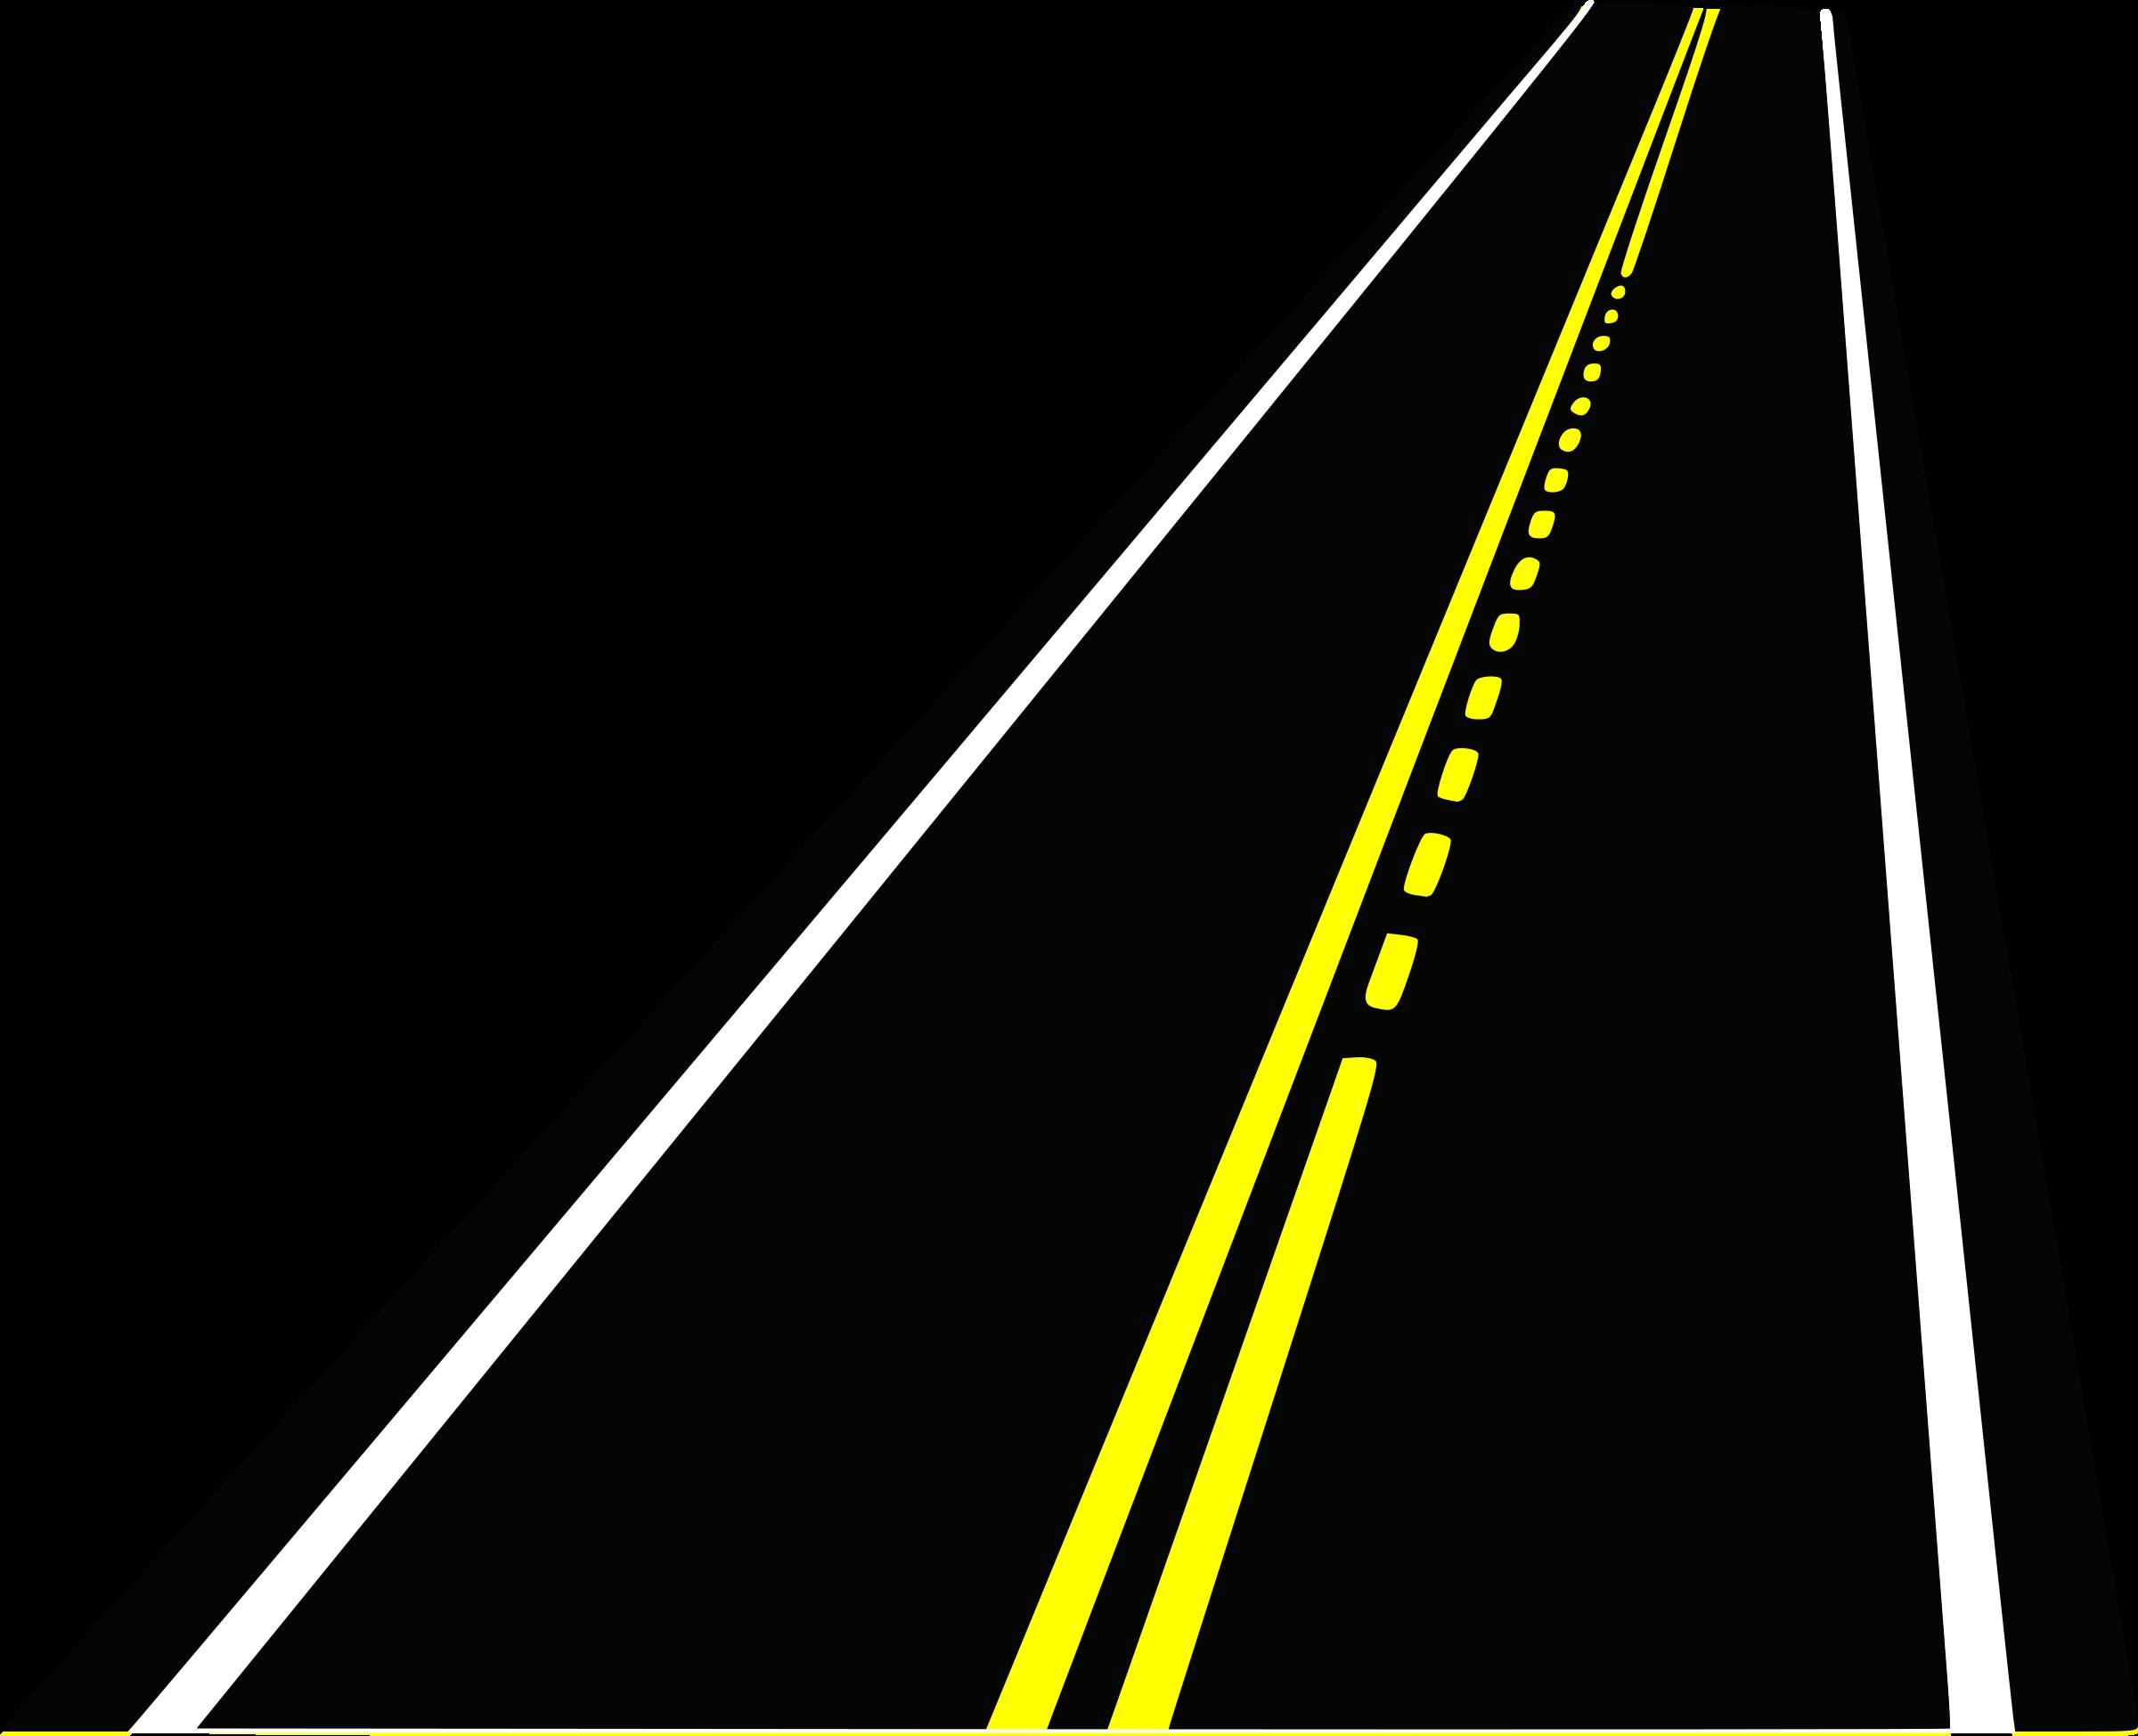 Road Background Clip Art Roadway 20clipart.